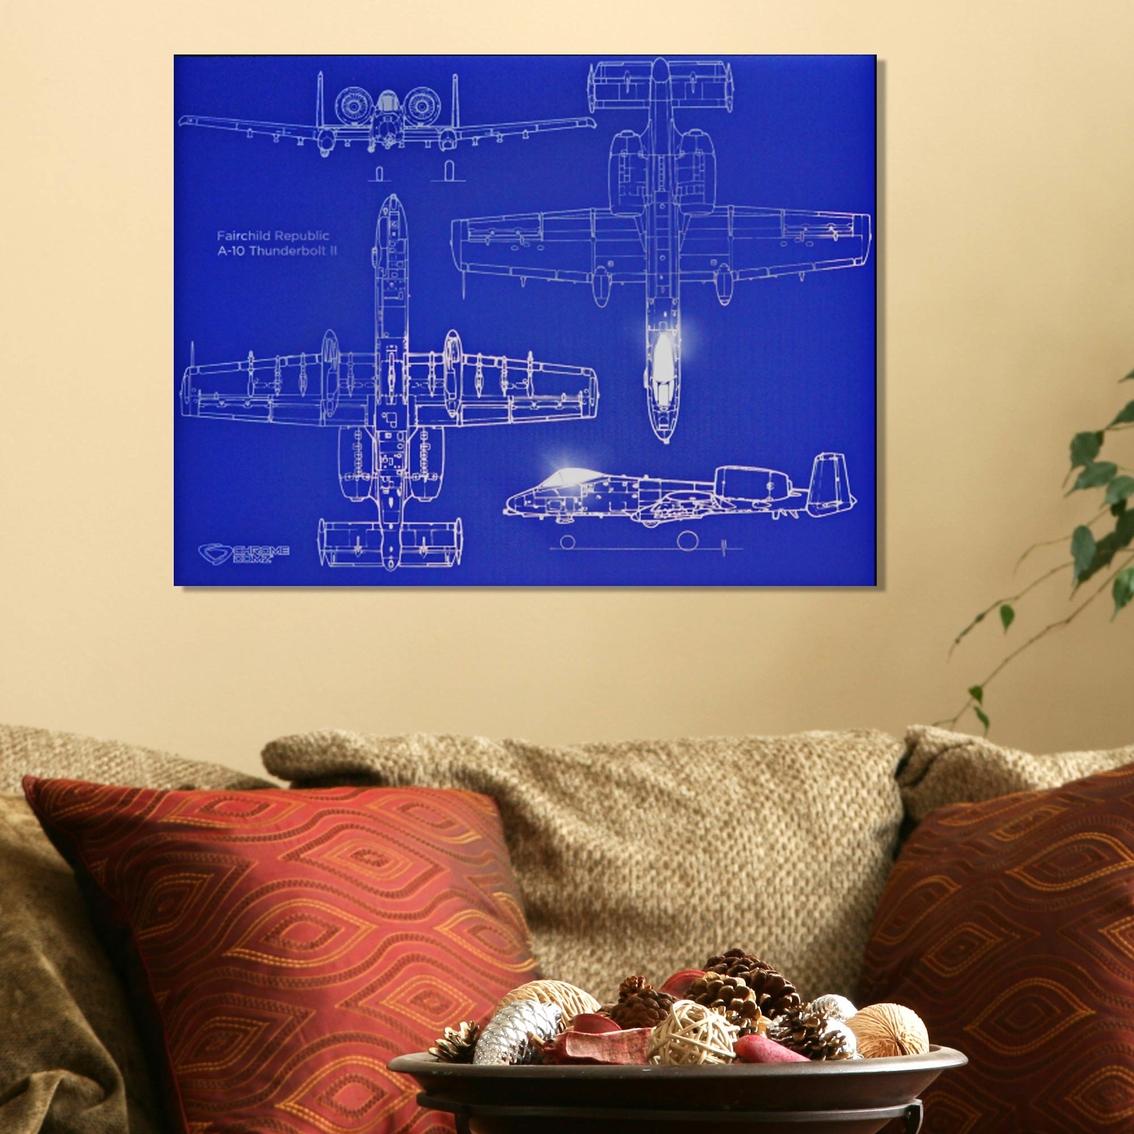 Chrome Domz Ss A-10 Tbii Blueprint Art   Home Decor   Military ...